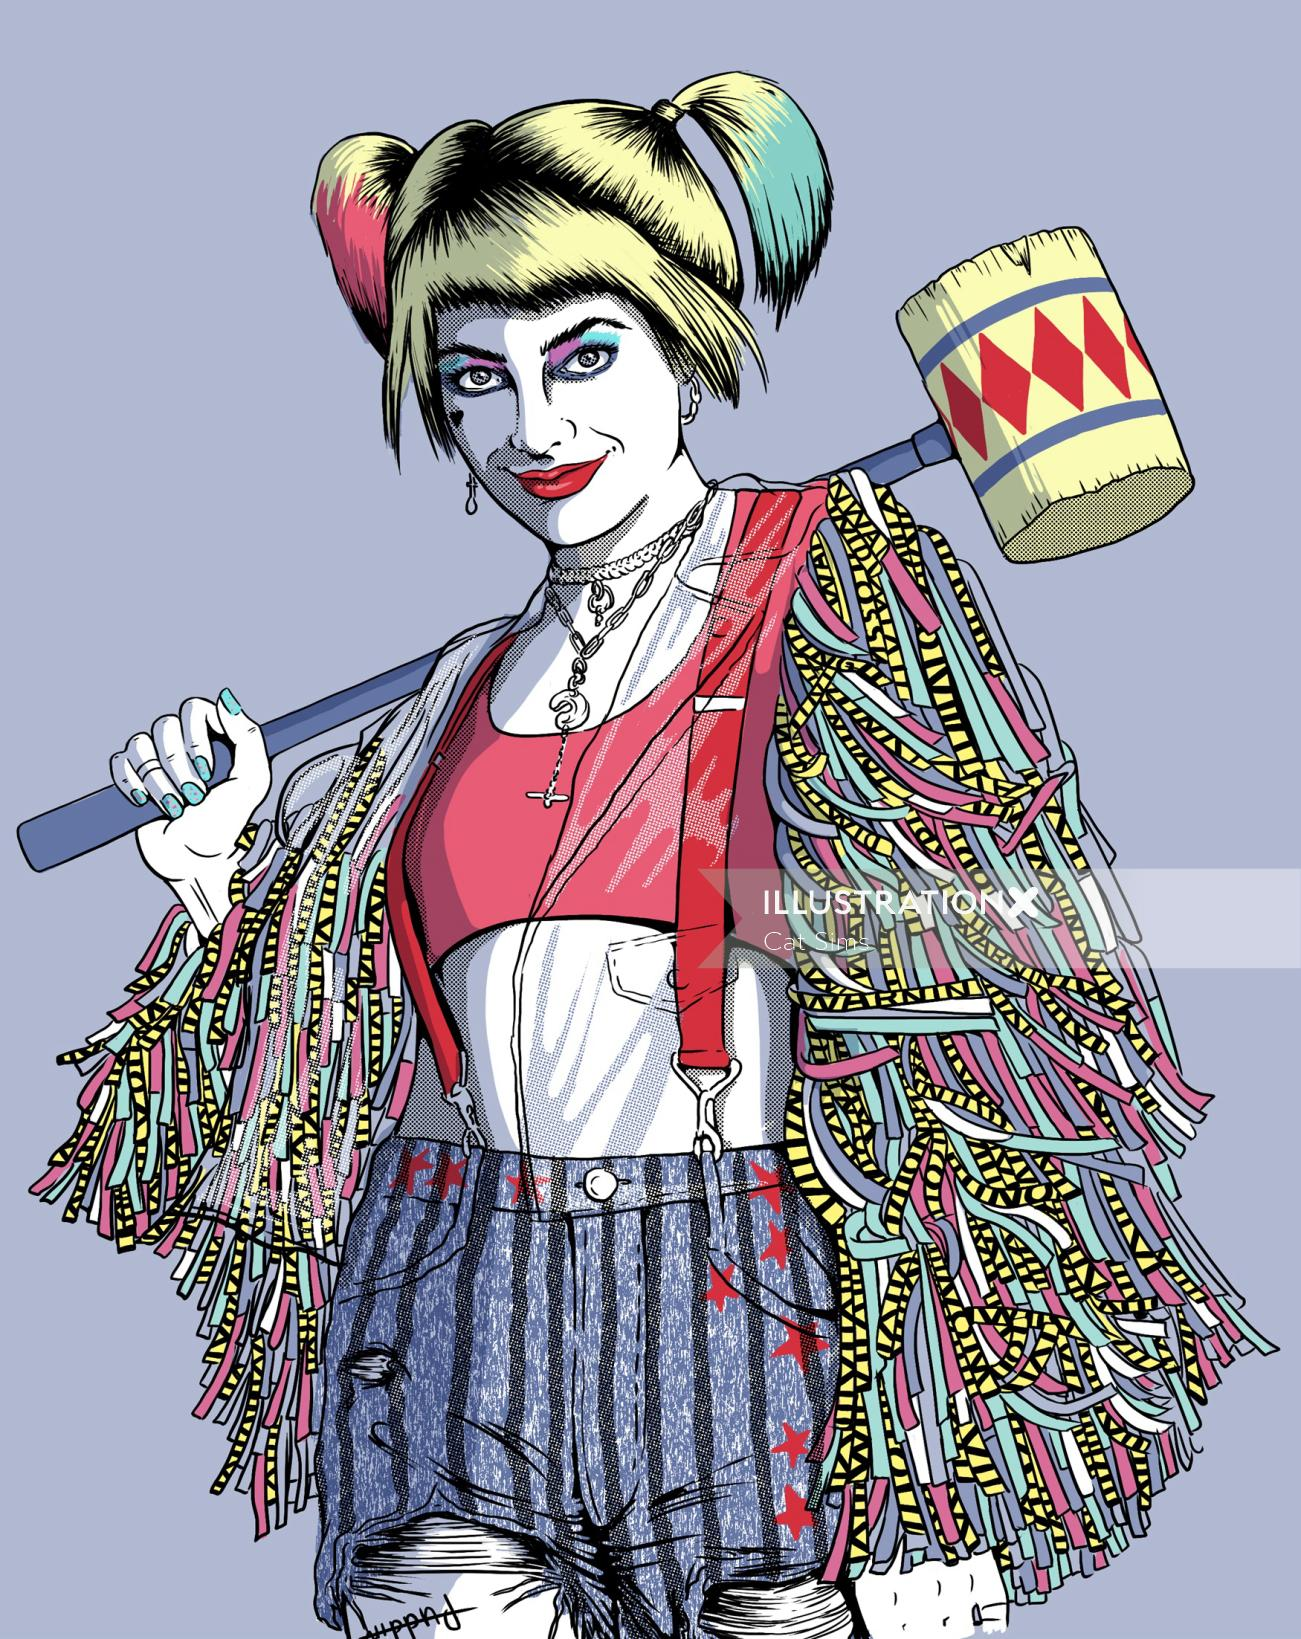 Comic illustration of Syco girl